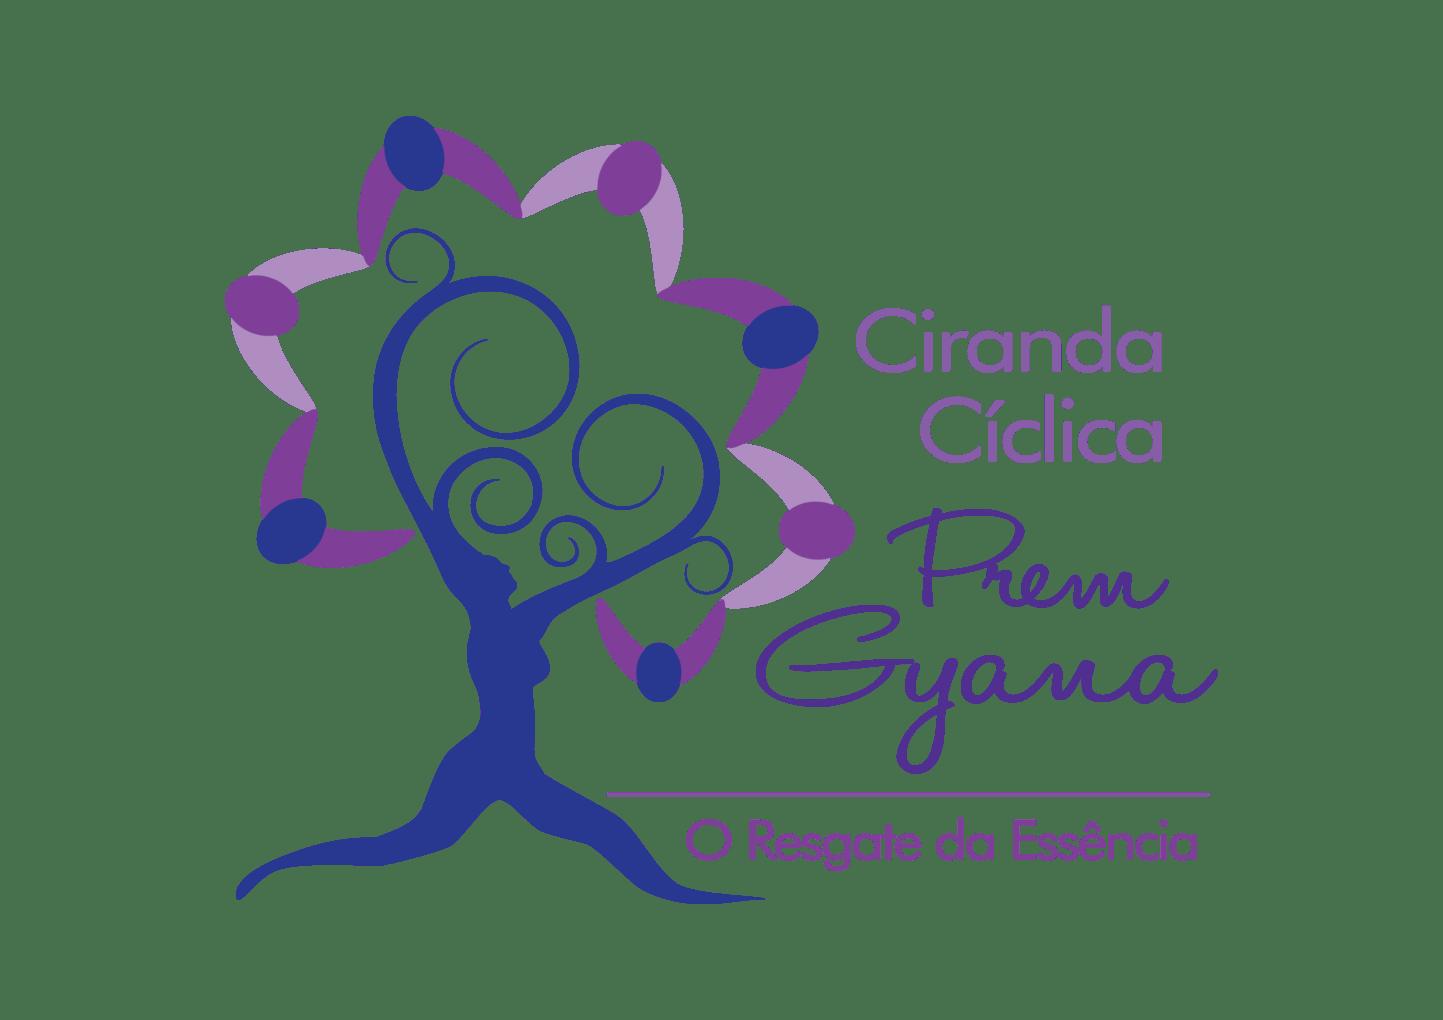 Sagrado Feminino Ciranda feminina | ciranda ciclica – Prem Gyana